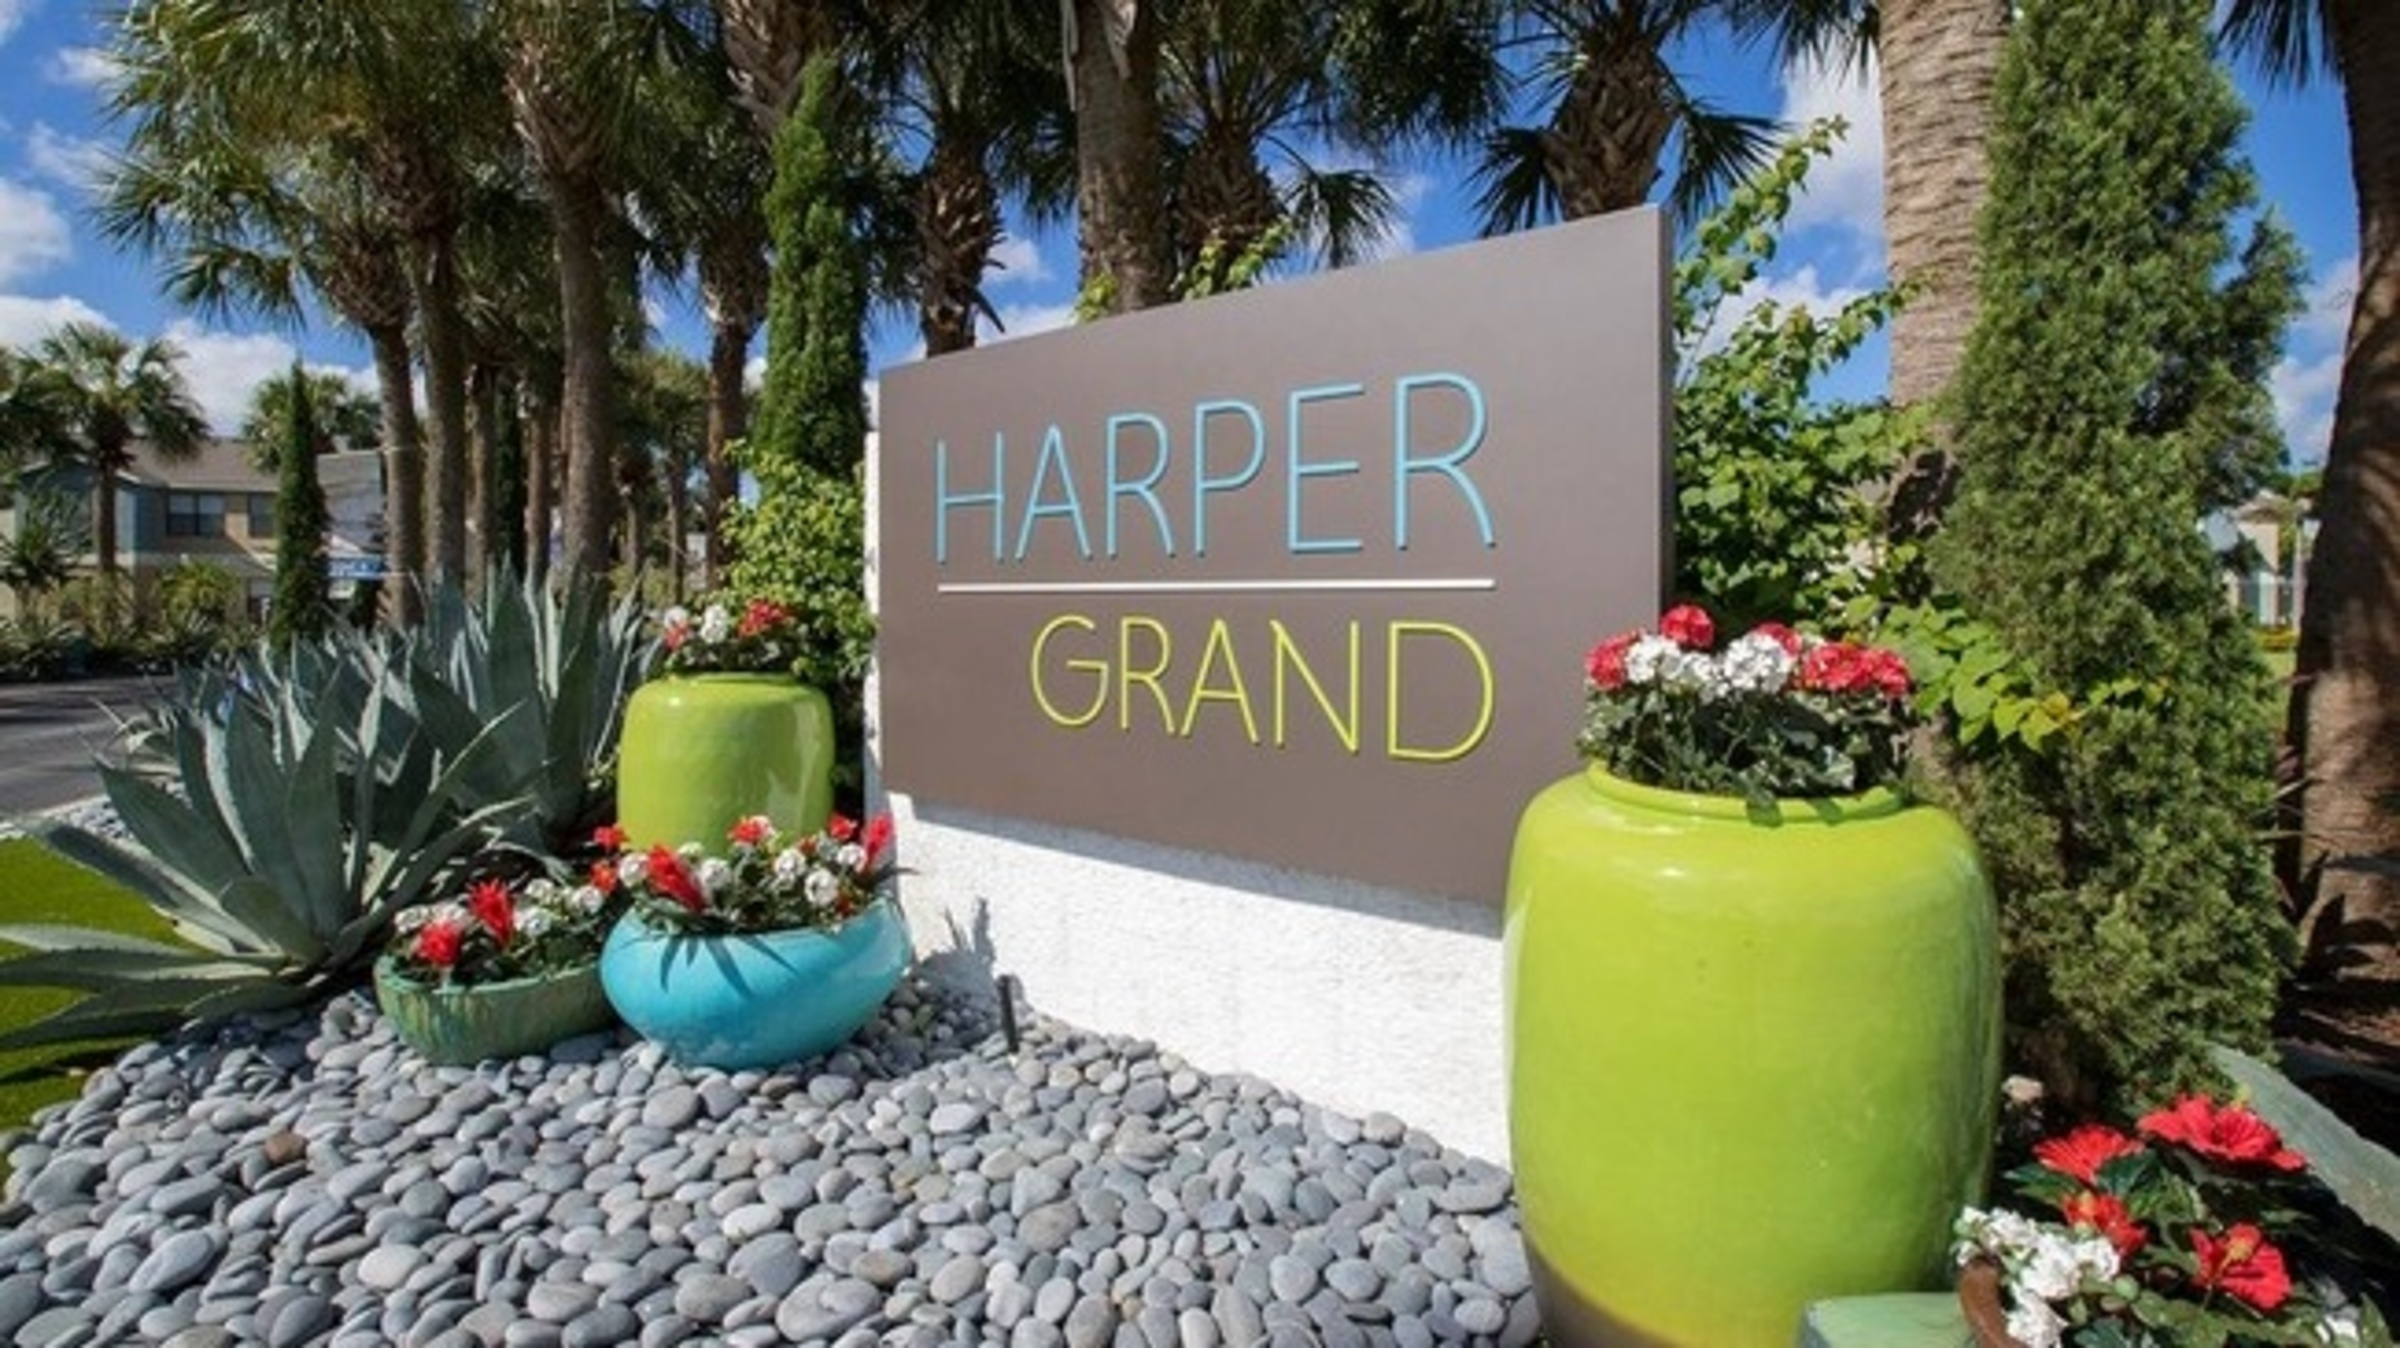 Harper Grand